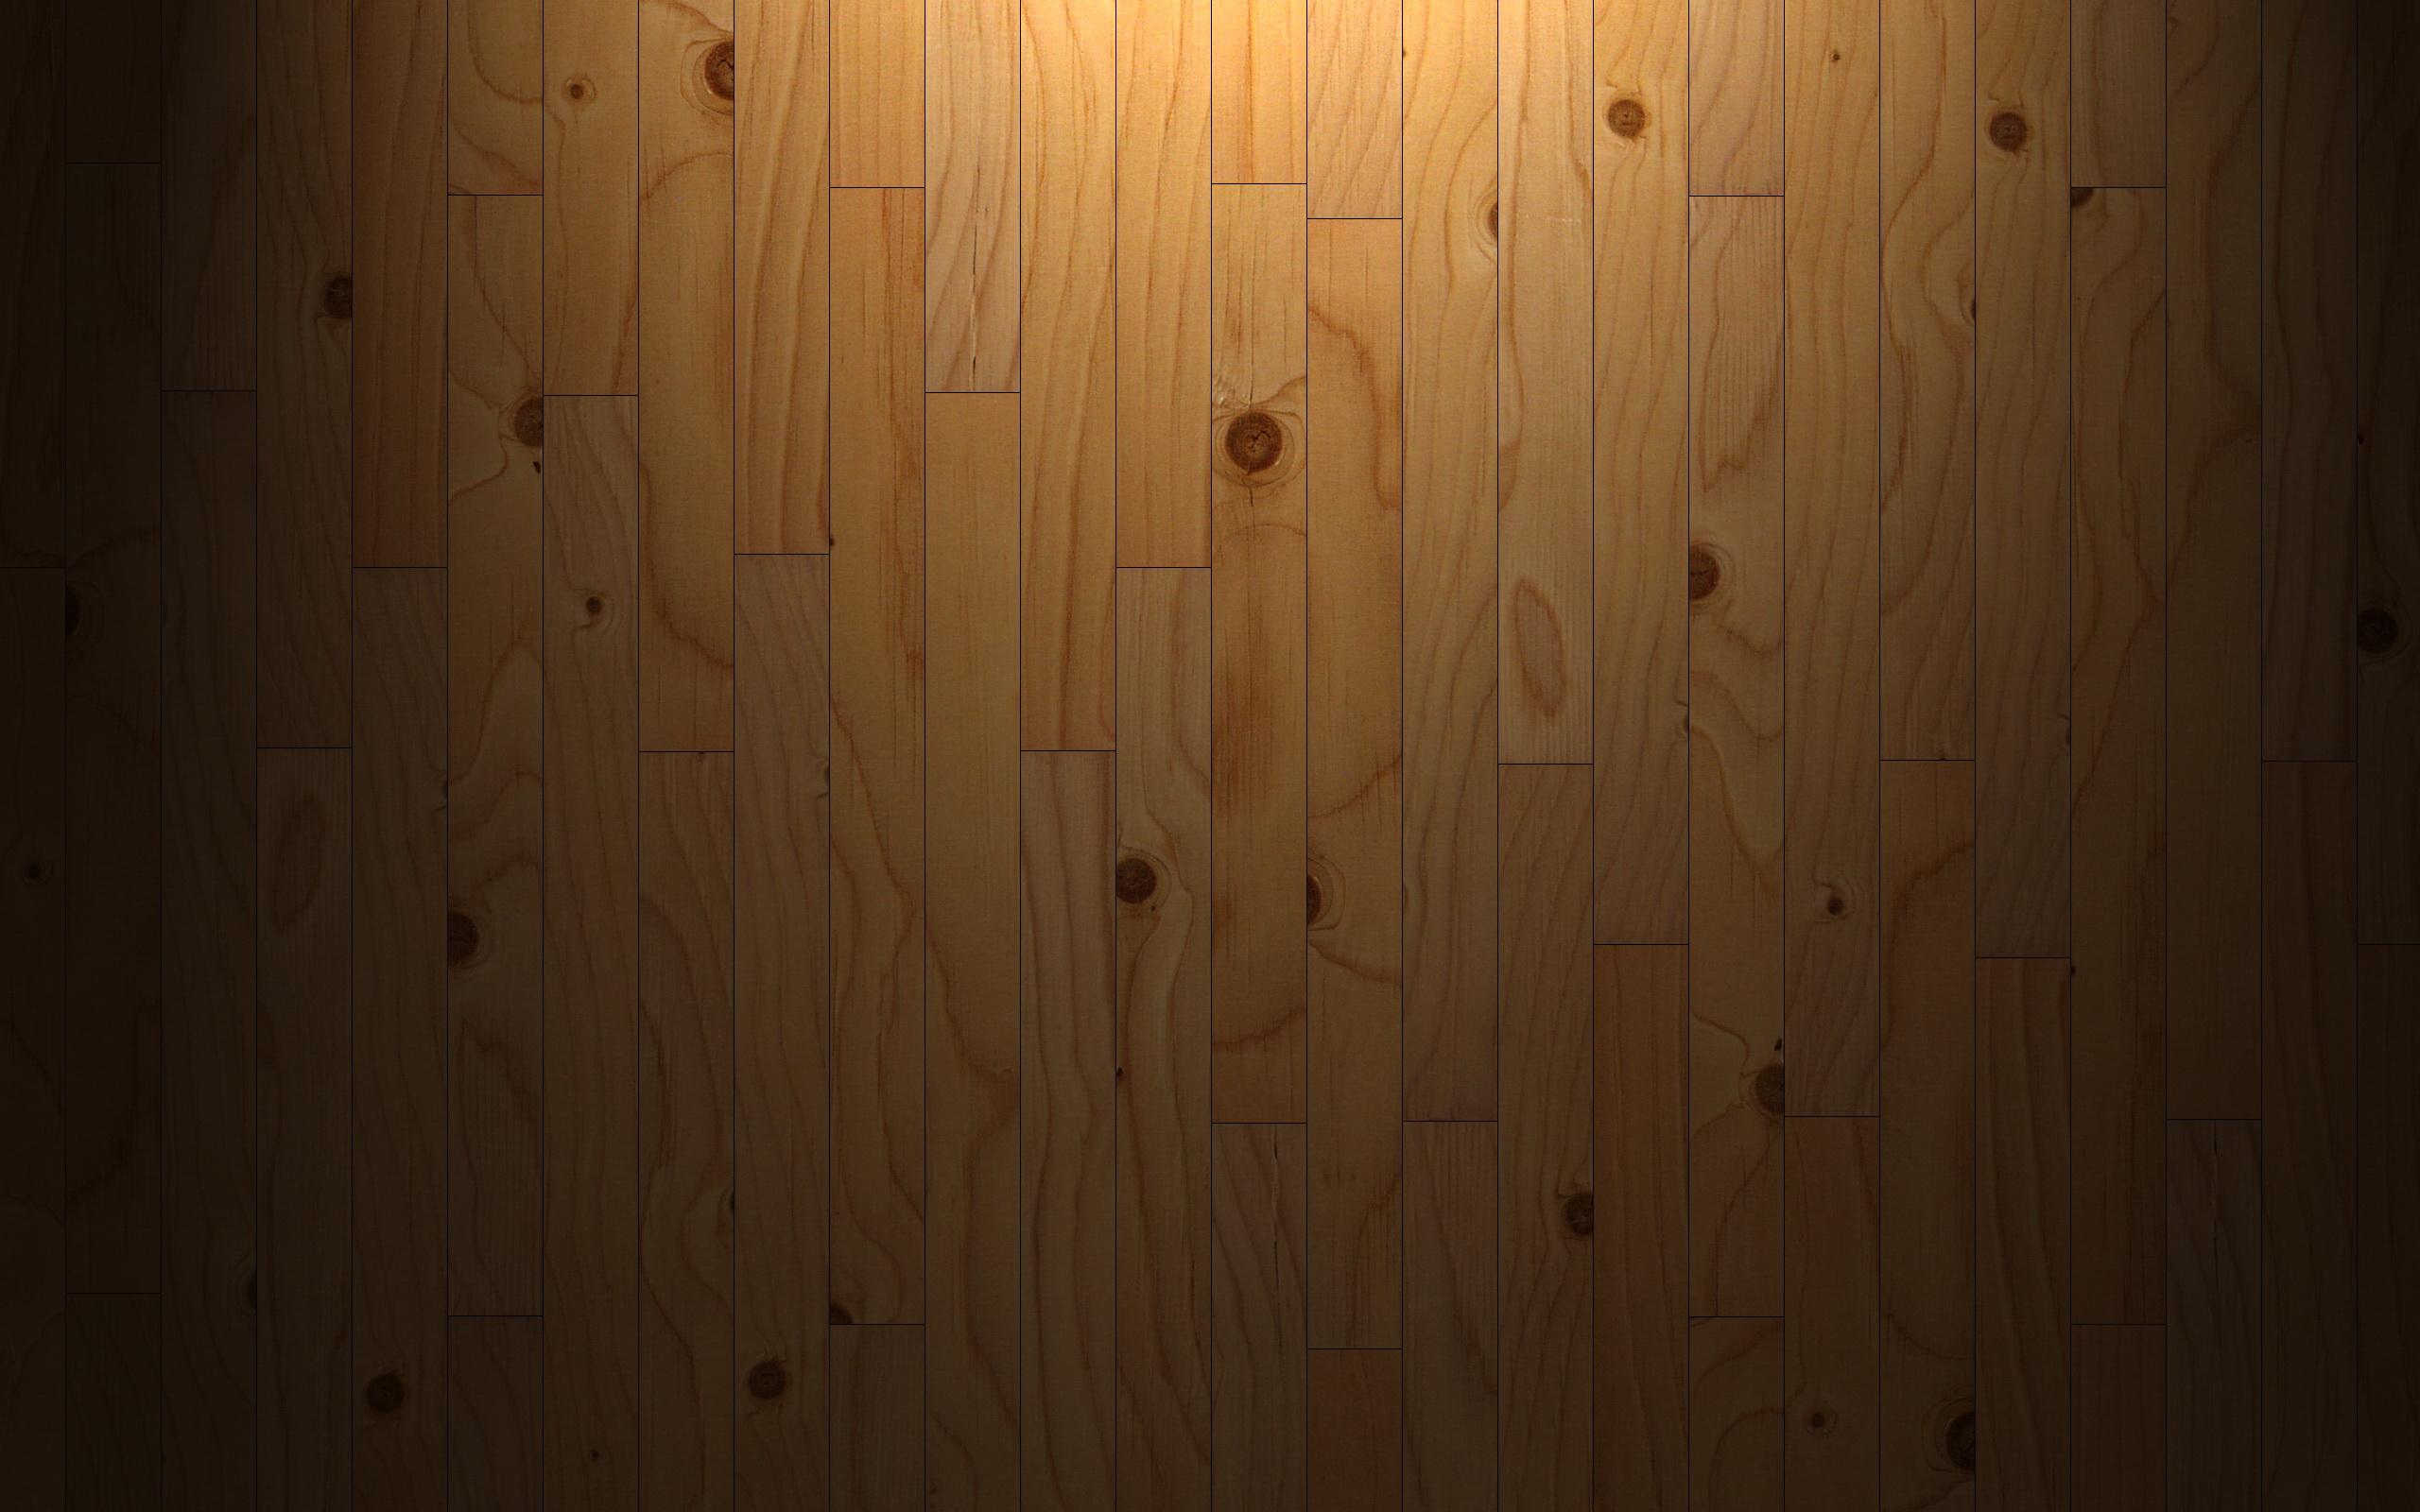 wood wallpaper light